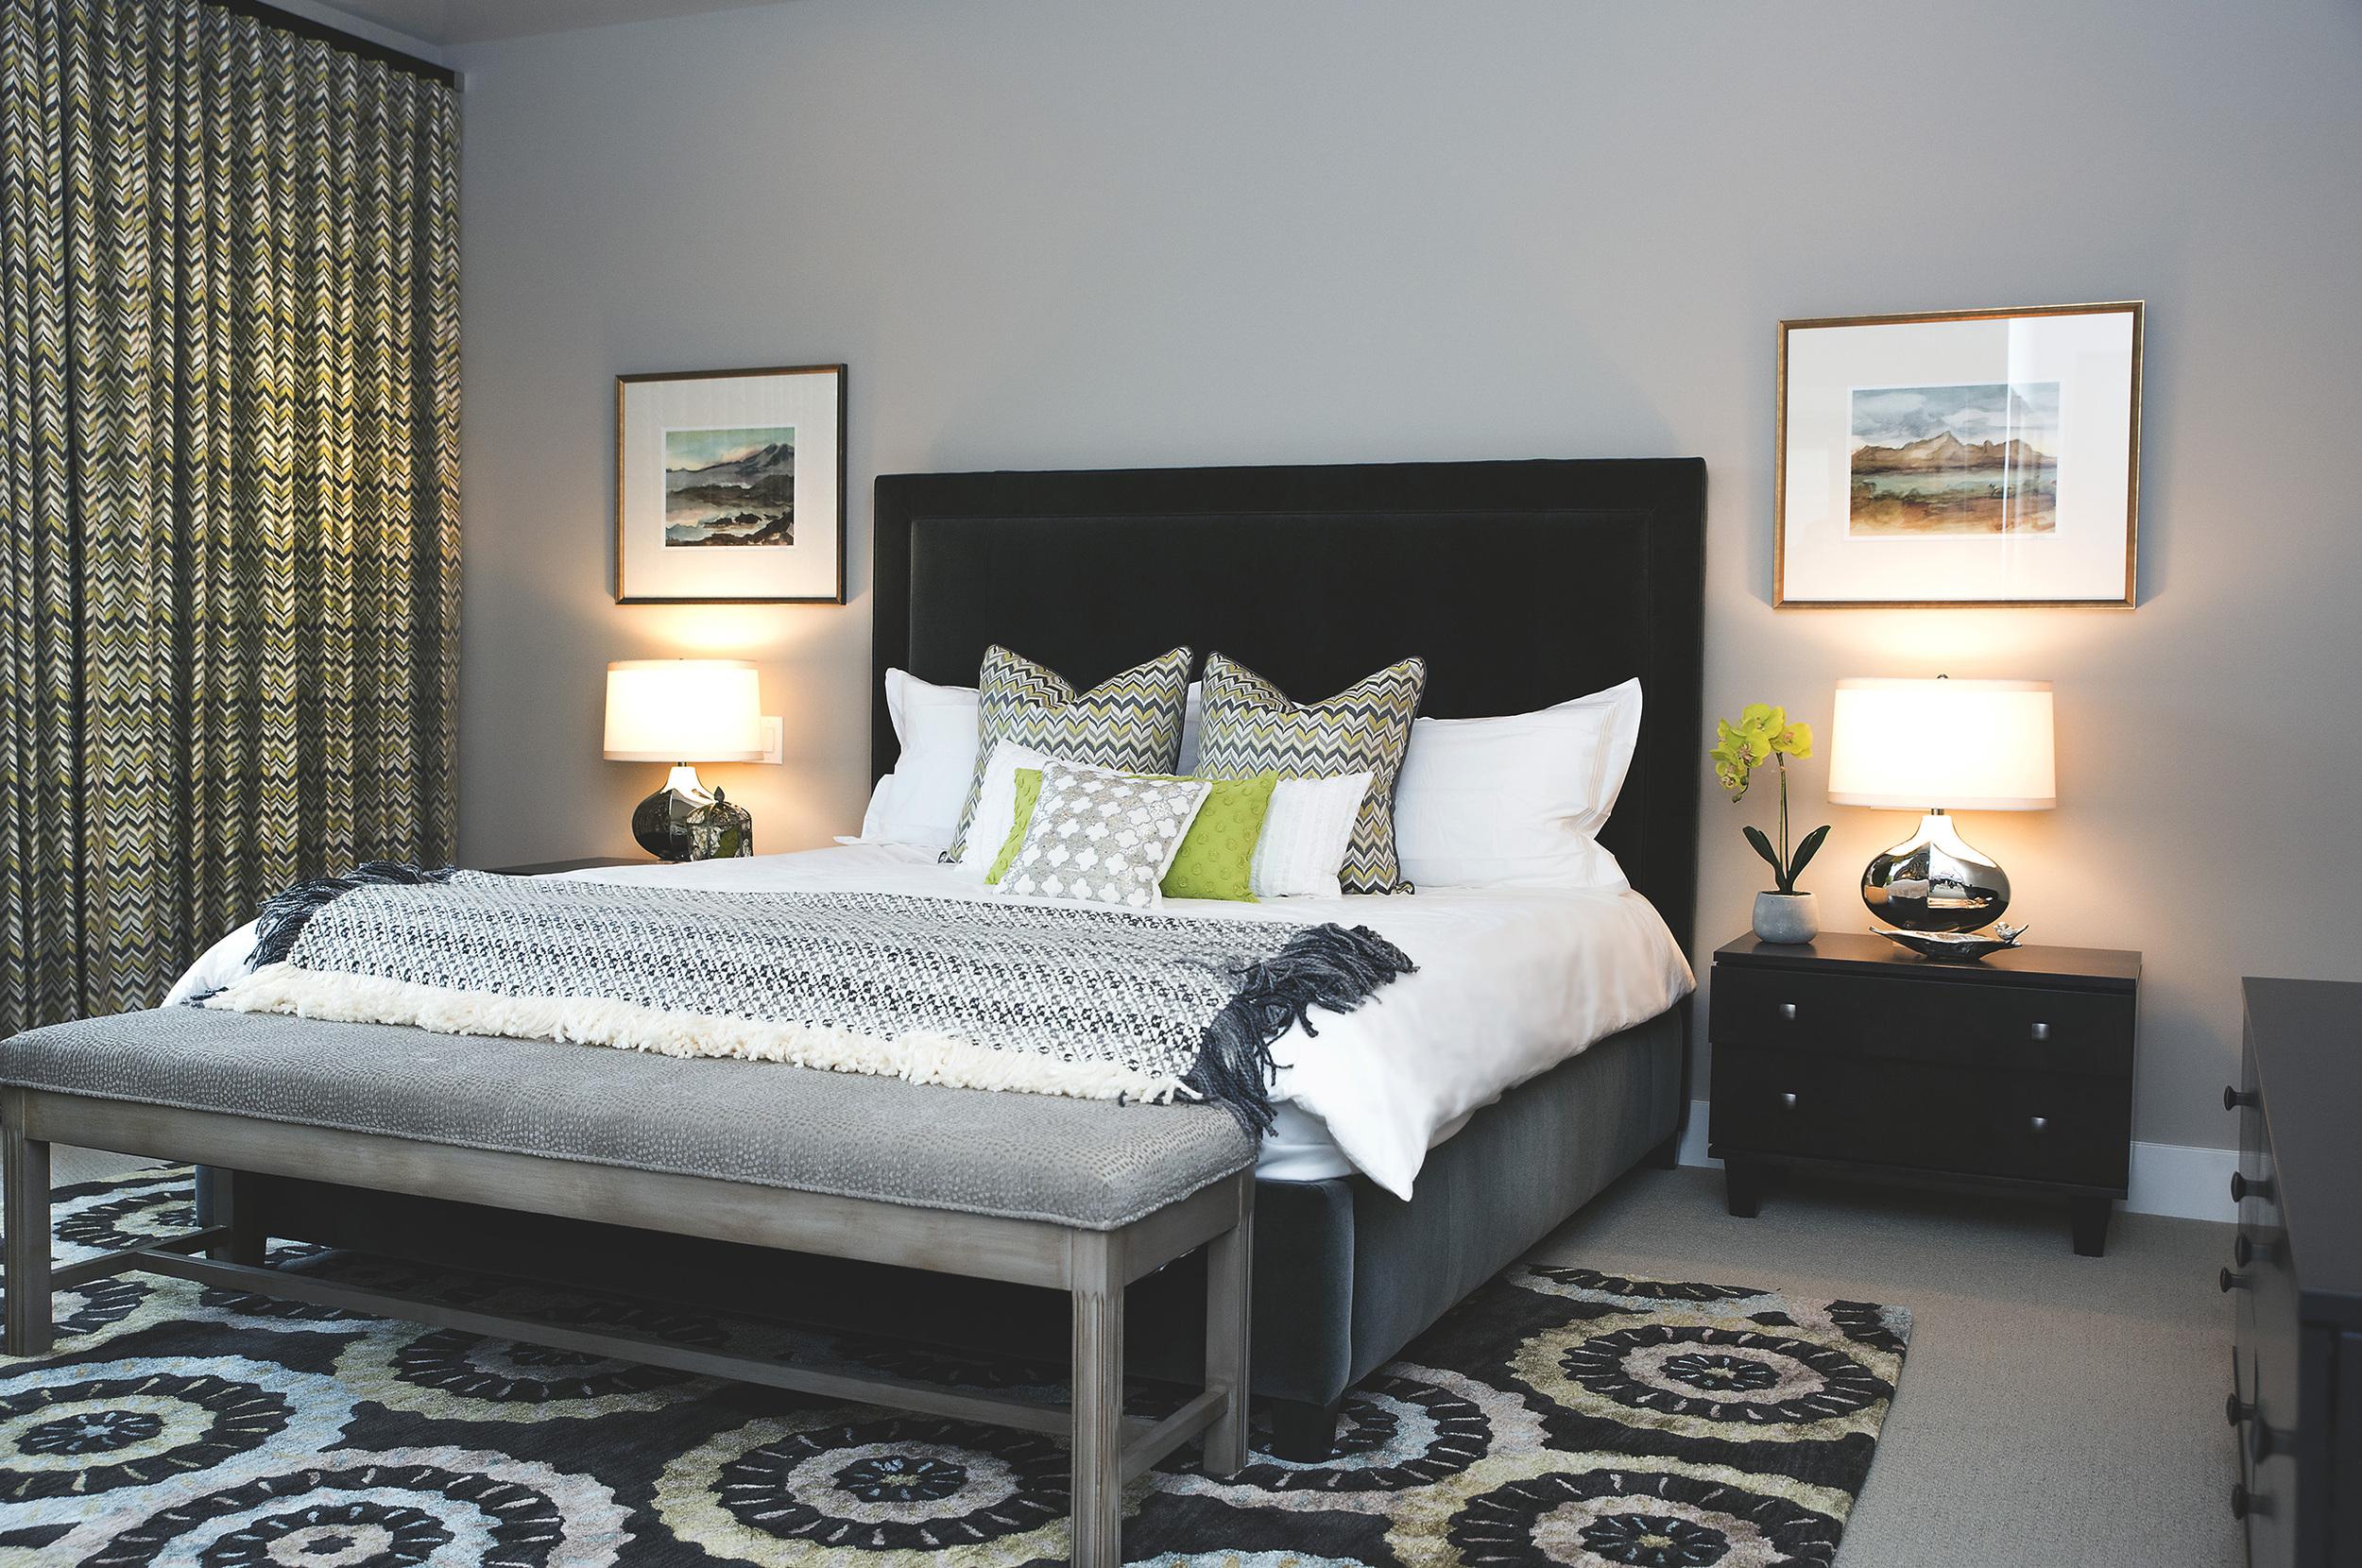 Amazing master bedroom designed by Tatiana Hisel Interior Design